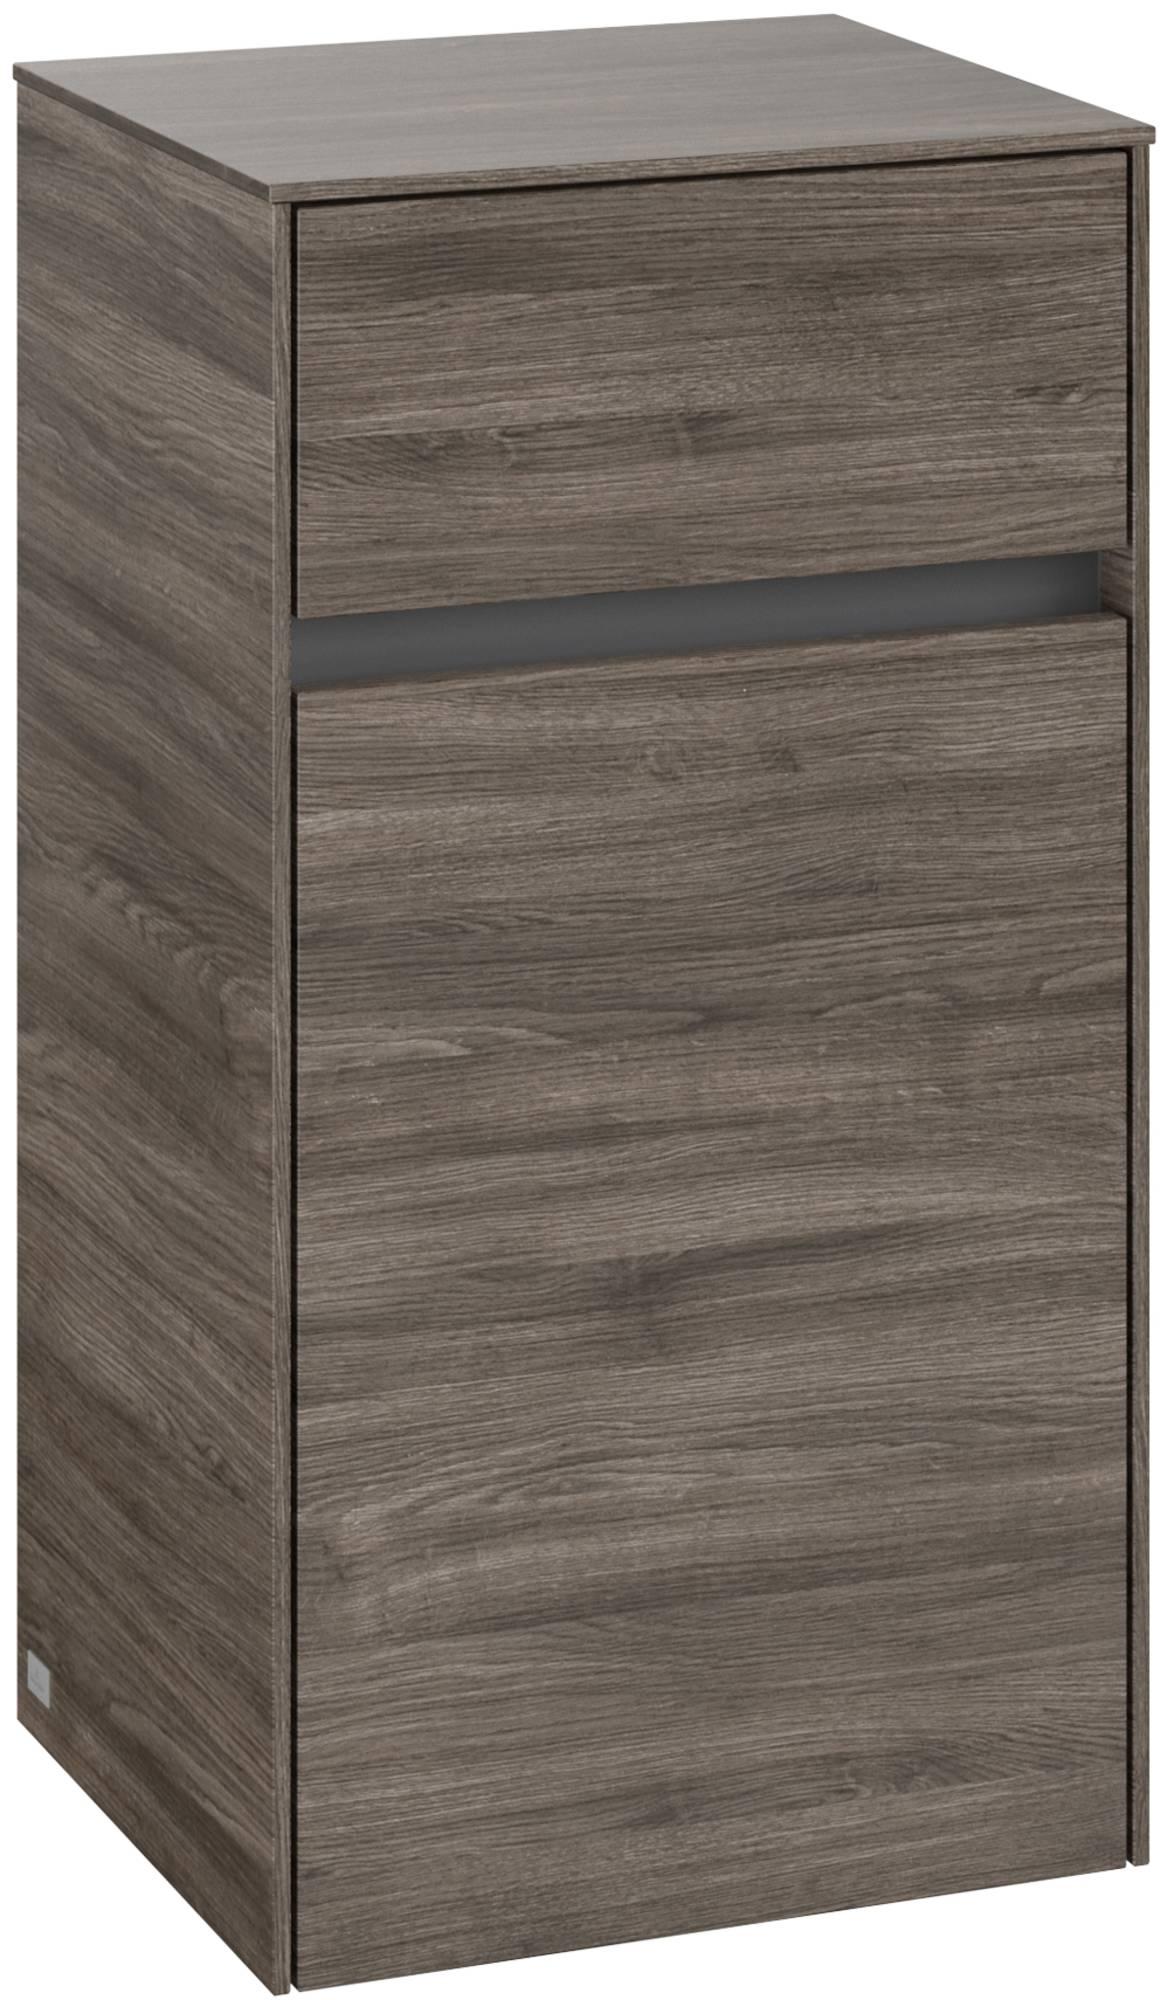 Villeroy & Boch Collaro Zijkast 40,4x34,9x74,8 cm Stone Oak